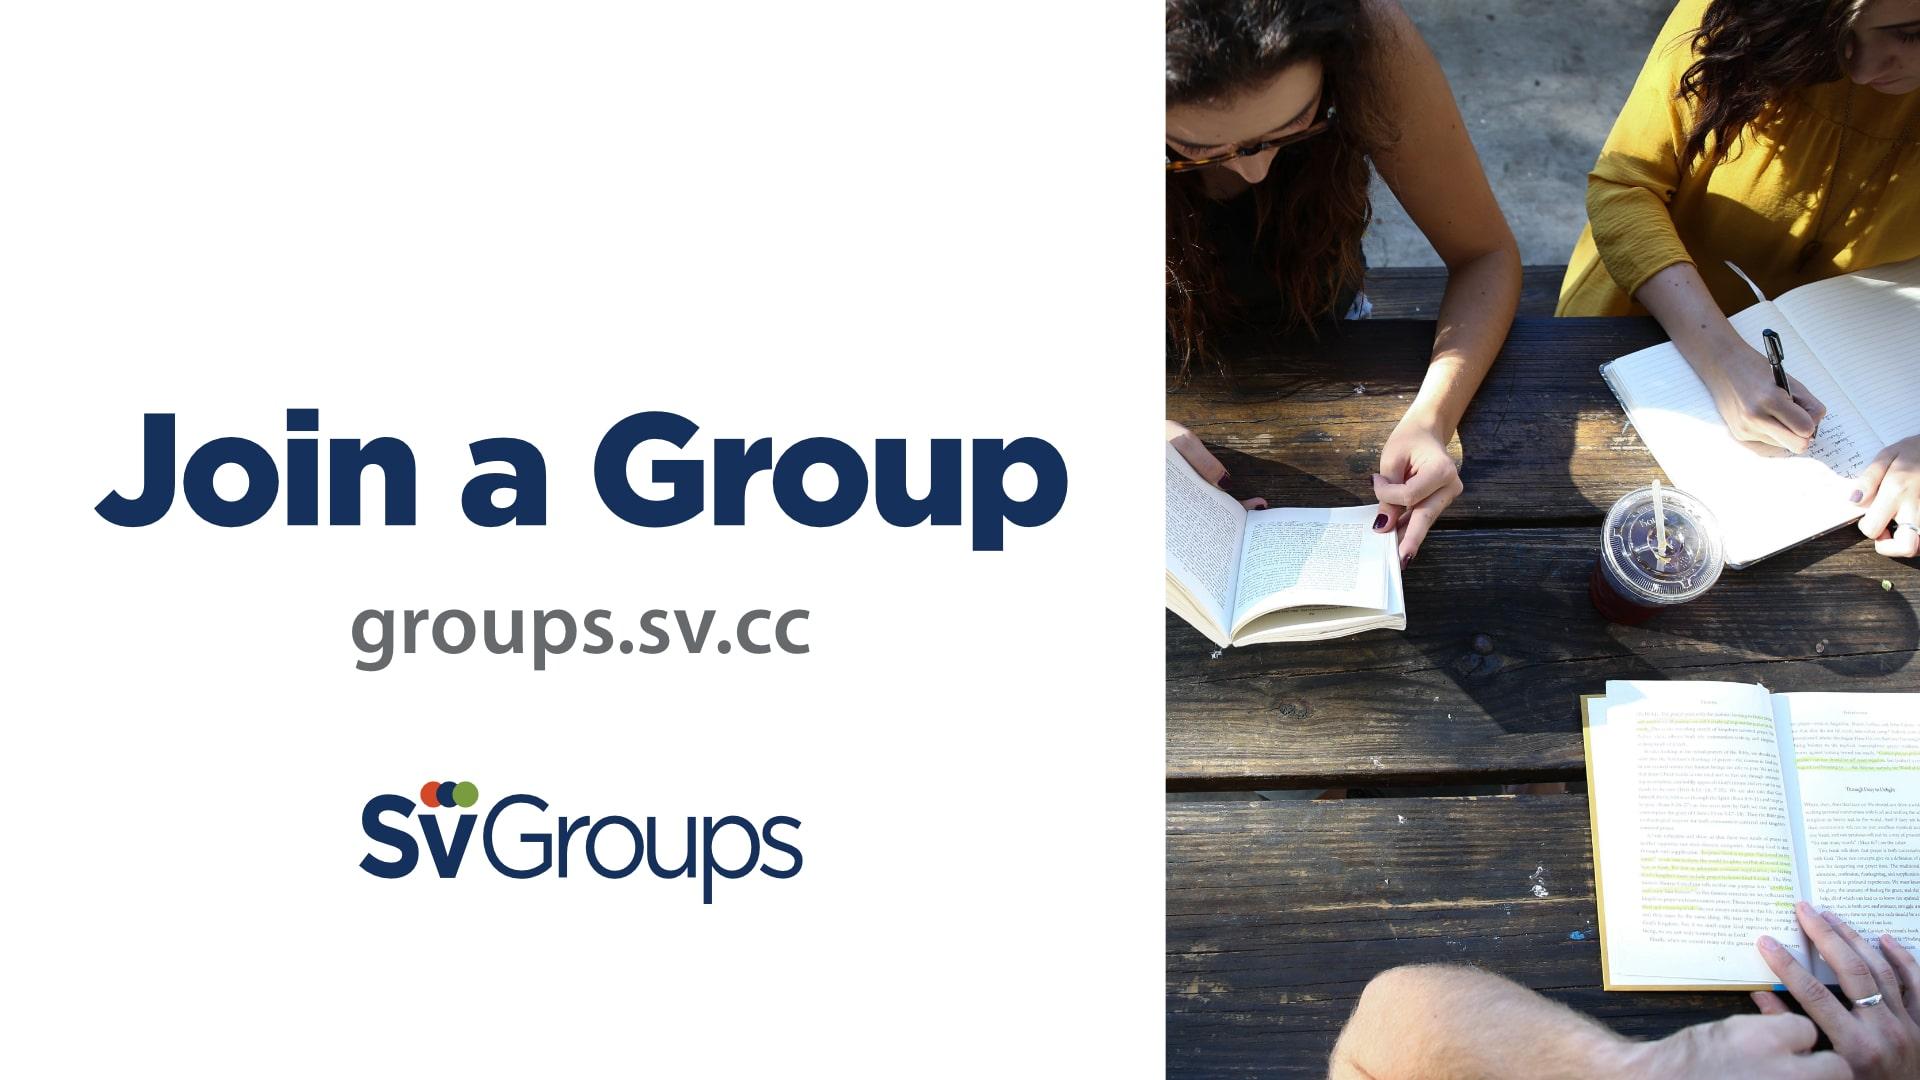 SV Groups